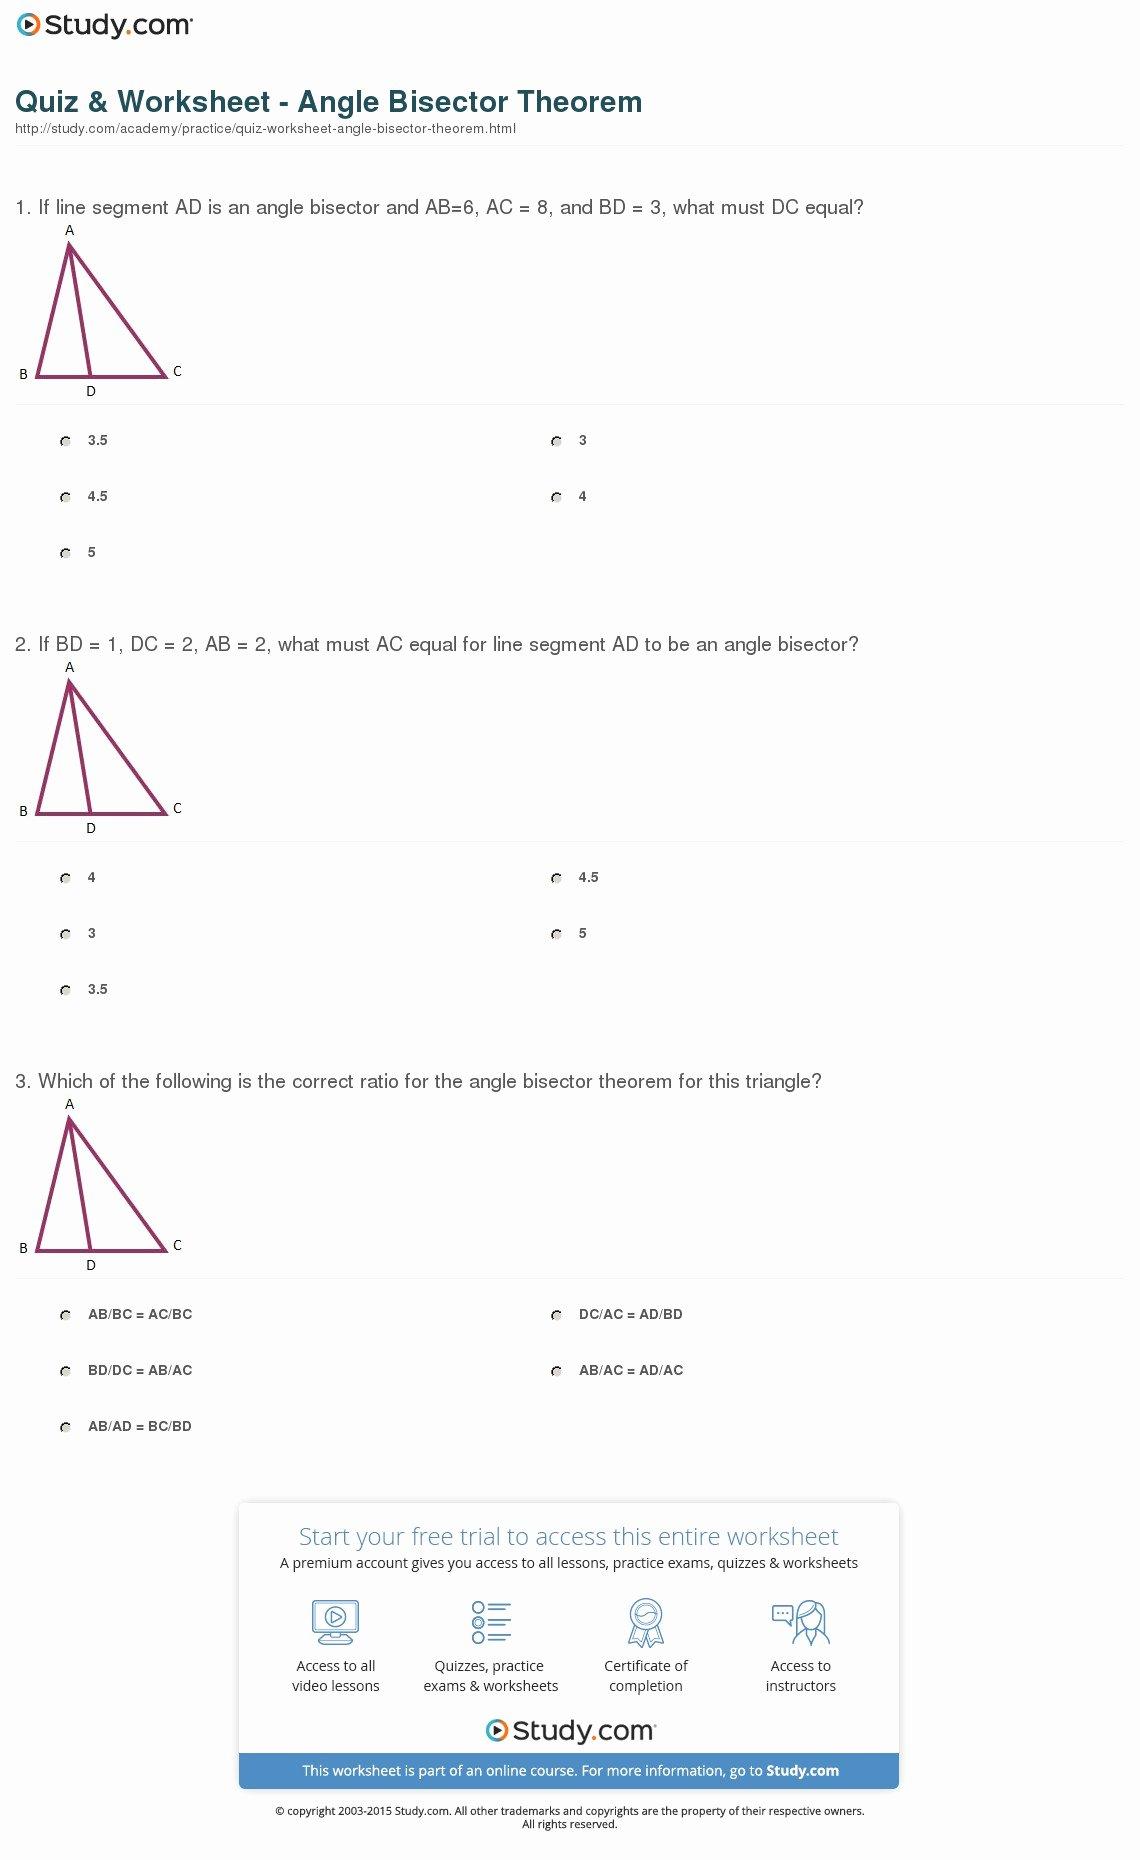 Angle Bisector theorem Worksheet Unique Quiz & Worksheet Angle Bisector theorem